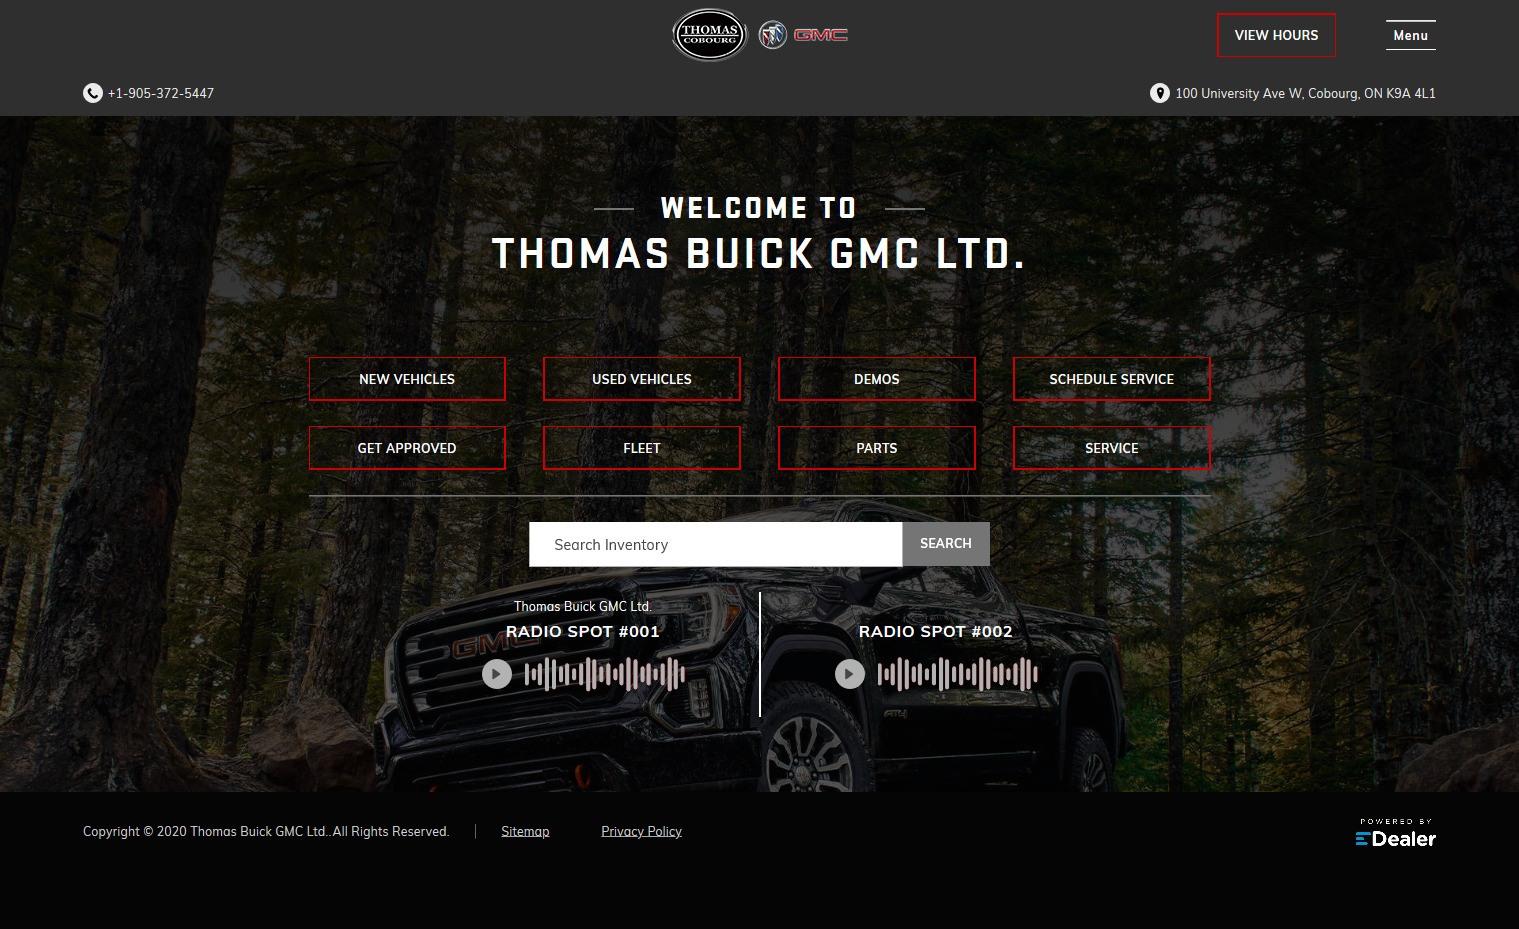 Thomas Buick GMC Ltd